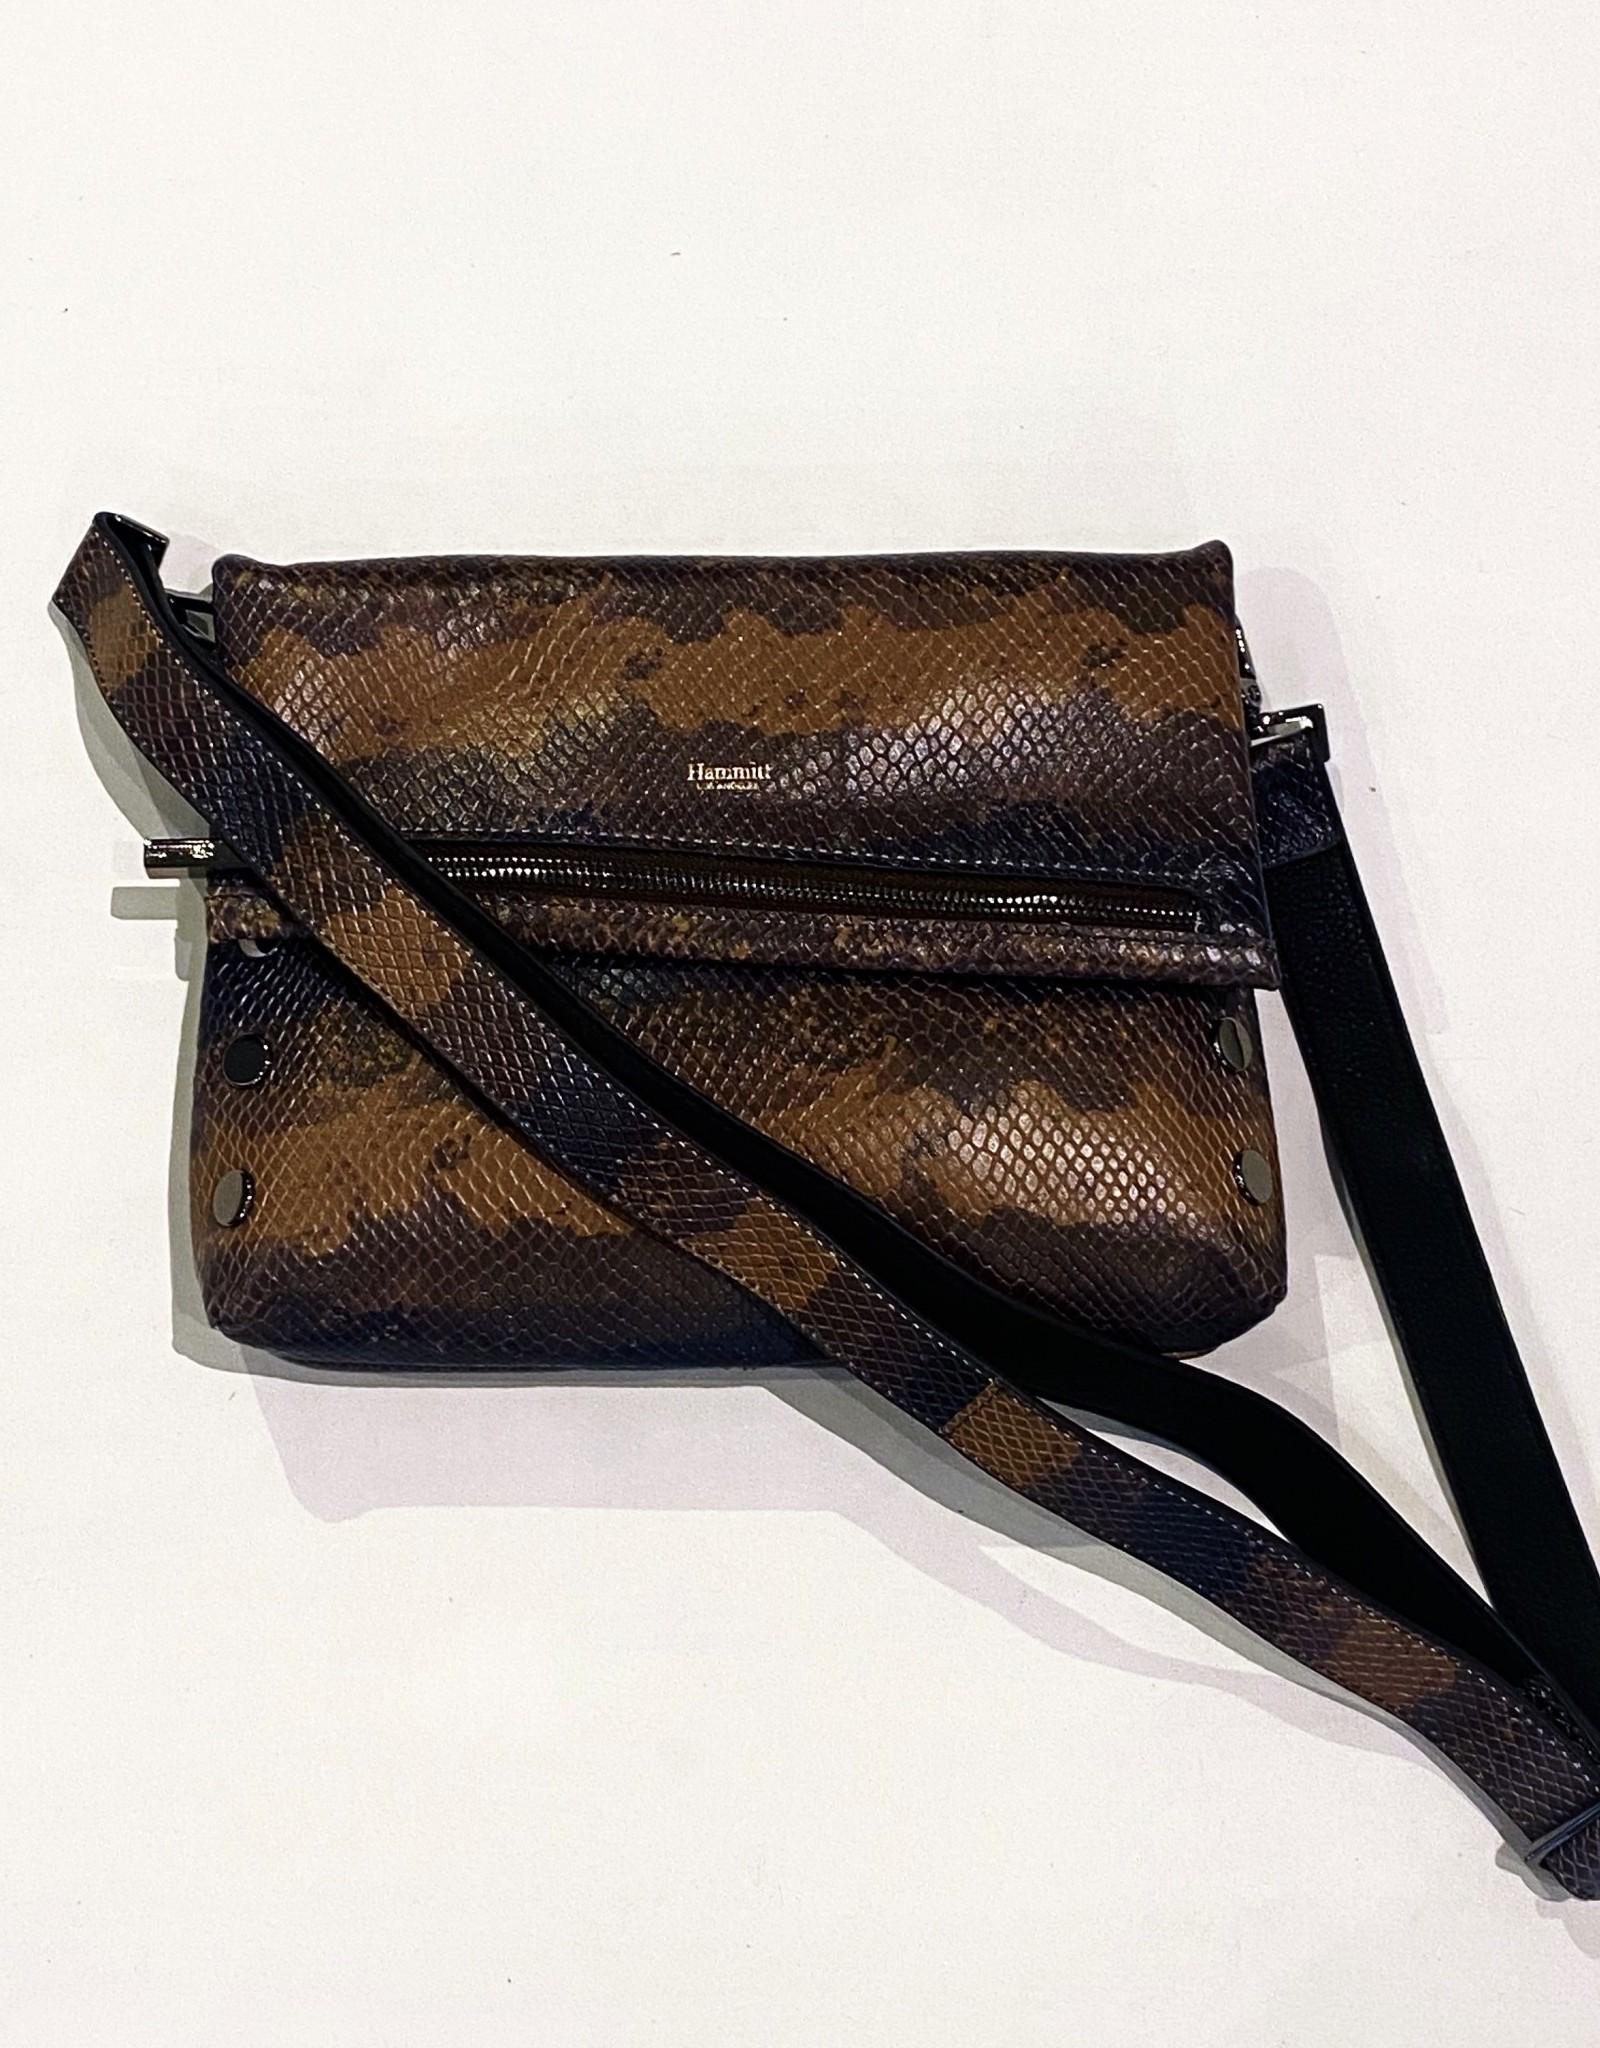 Hammitt VIP Medium leather purse